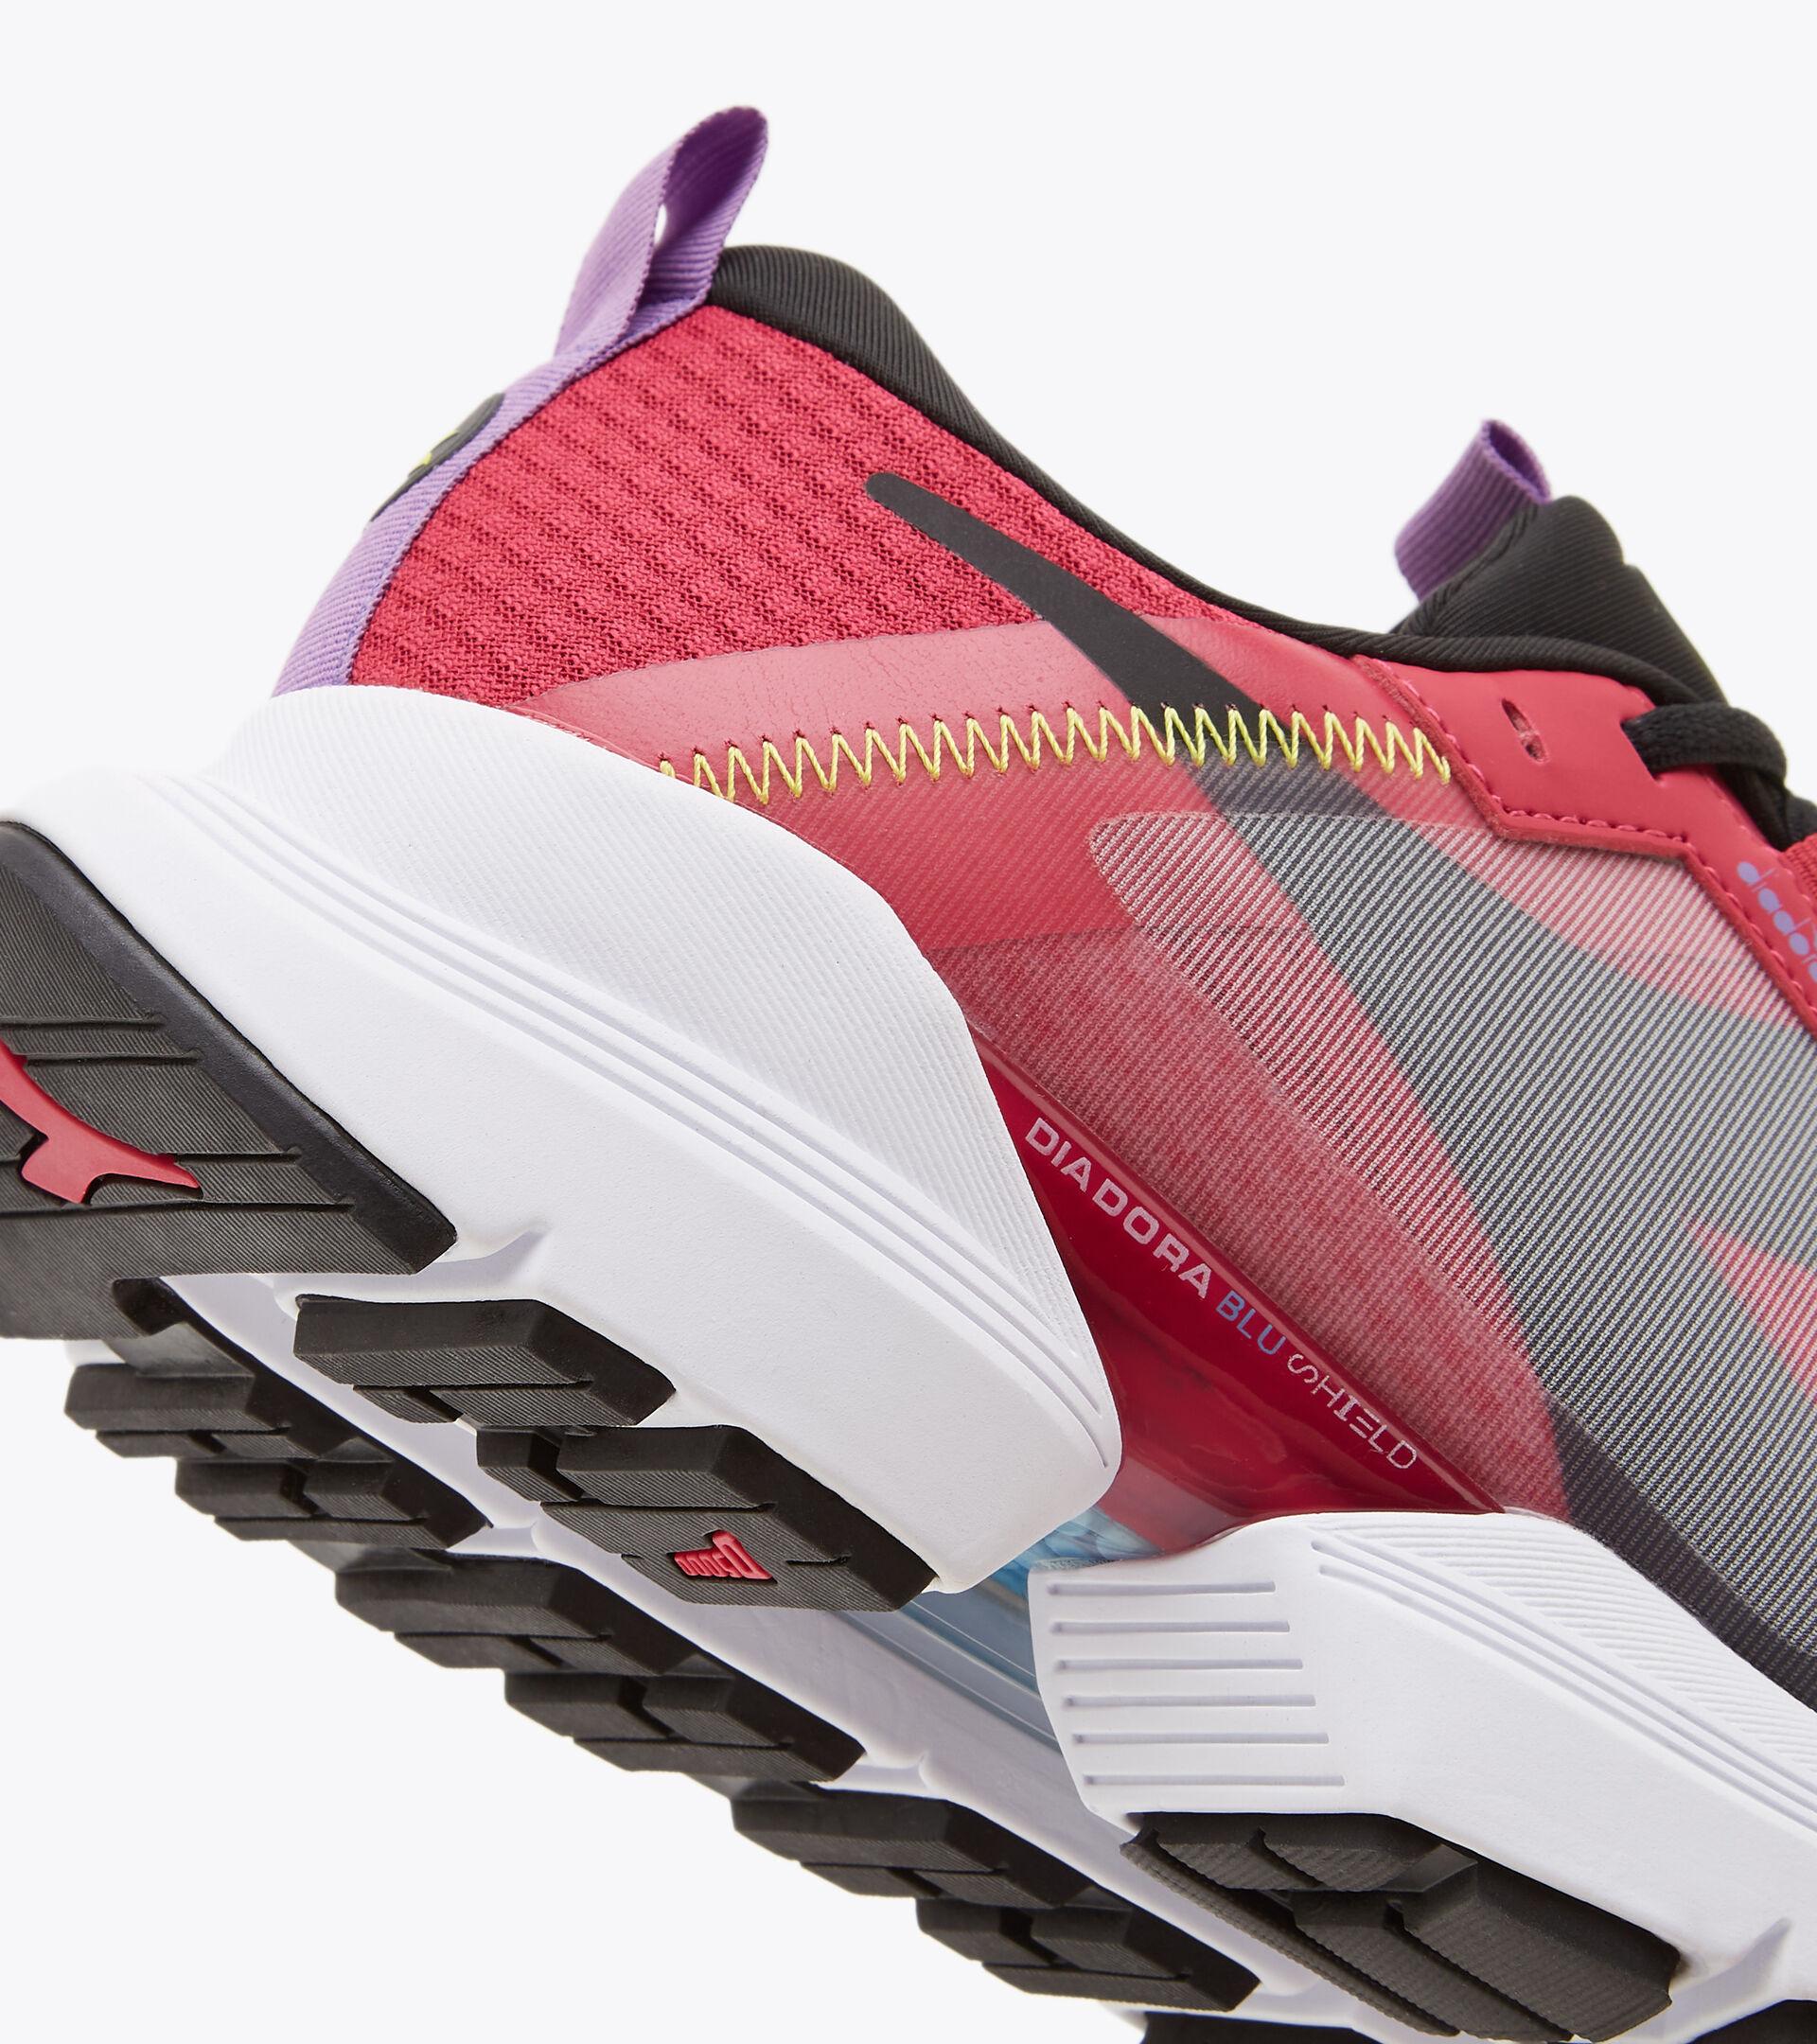 Chaussures de running - Femme MYTHOS BLUSHIELD ELITE TRX 2 W ROSE VOYANT/NOIR/VIOLET CAMPAN - Diadora